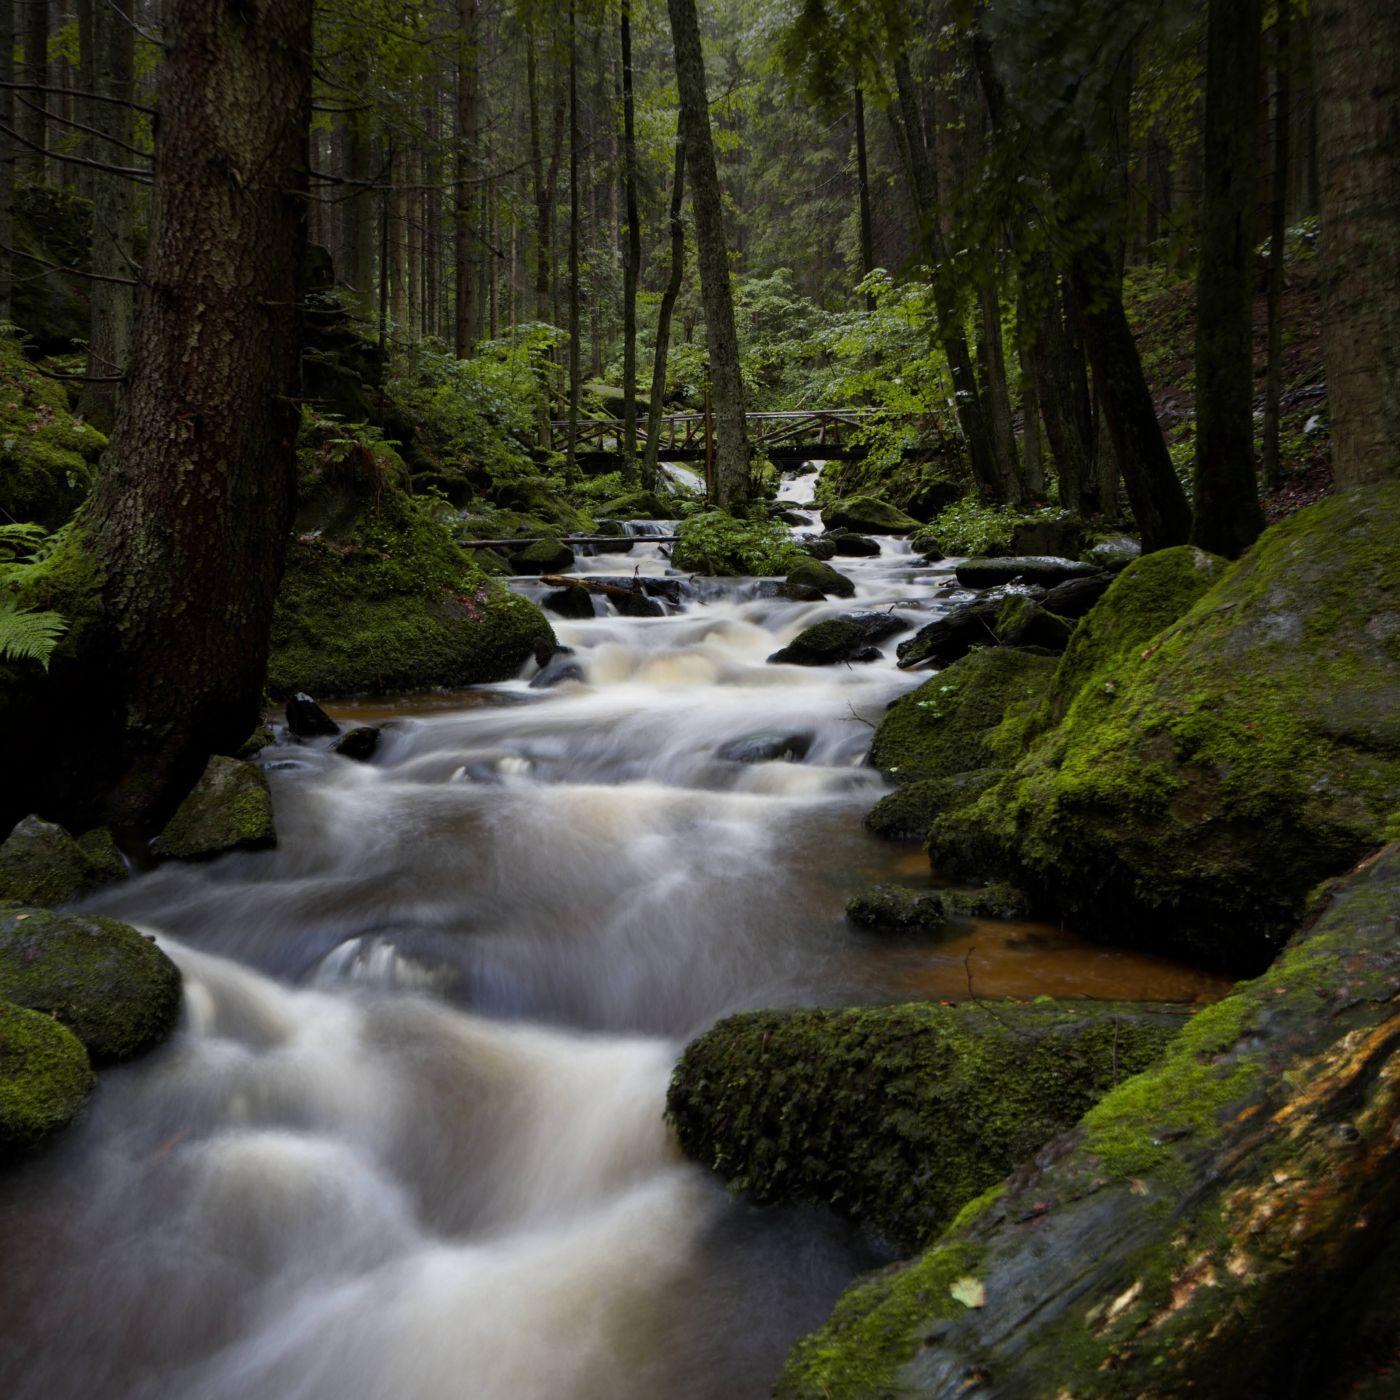 Vodopady Sv. Wolfganga, Czech Republic